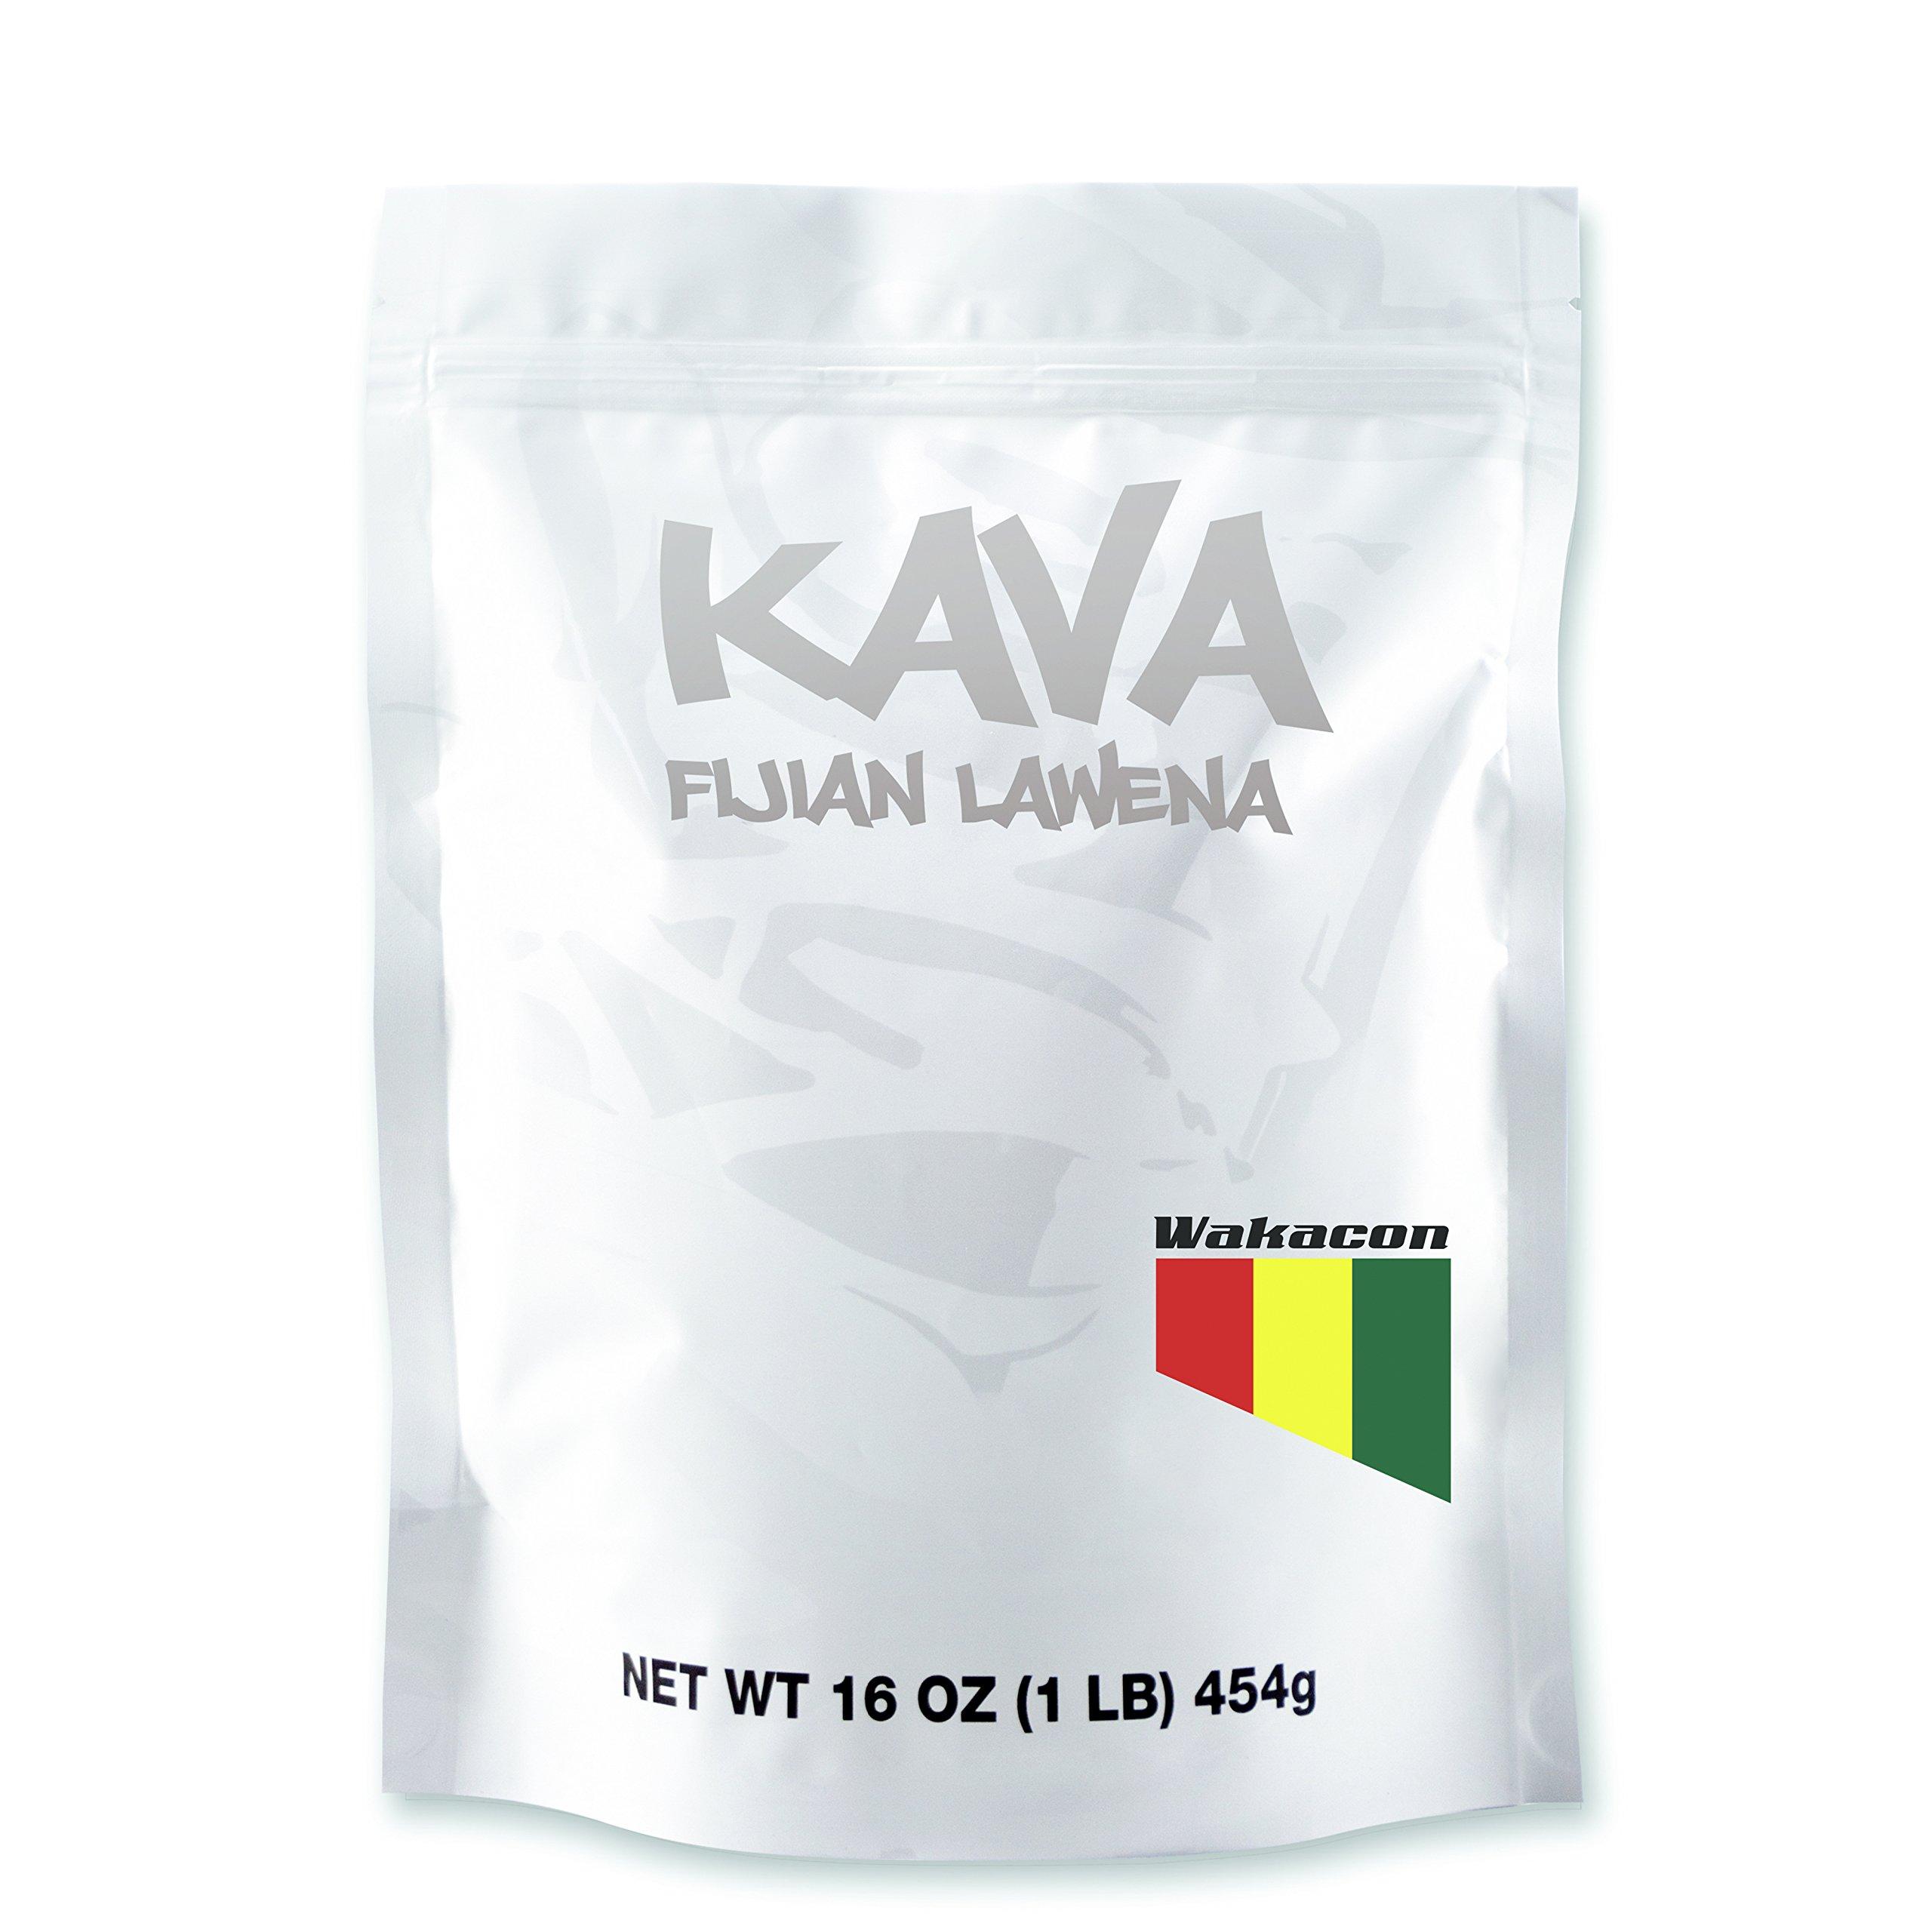 Wakacon KAVA LAWENA powder - Fijian Premium Noble High Quality Kava Root (1LB)